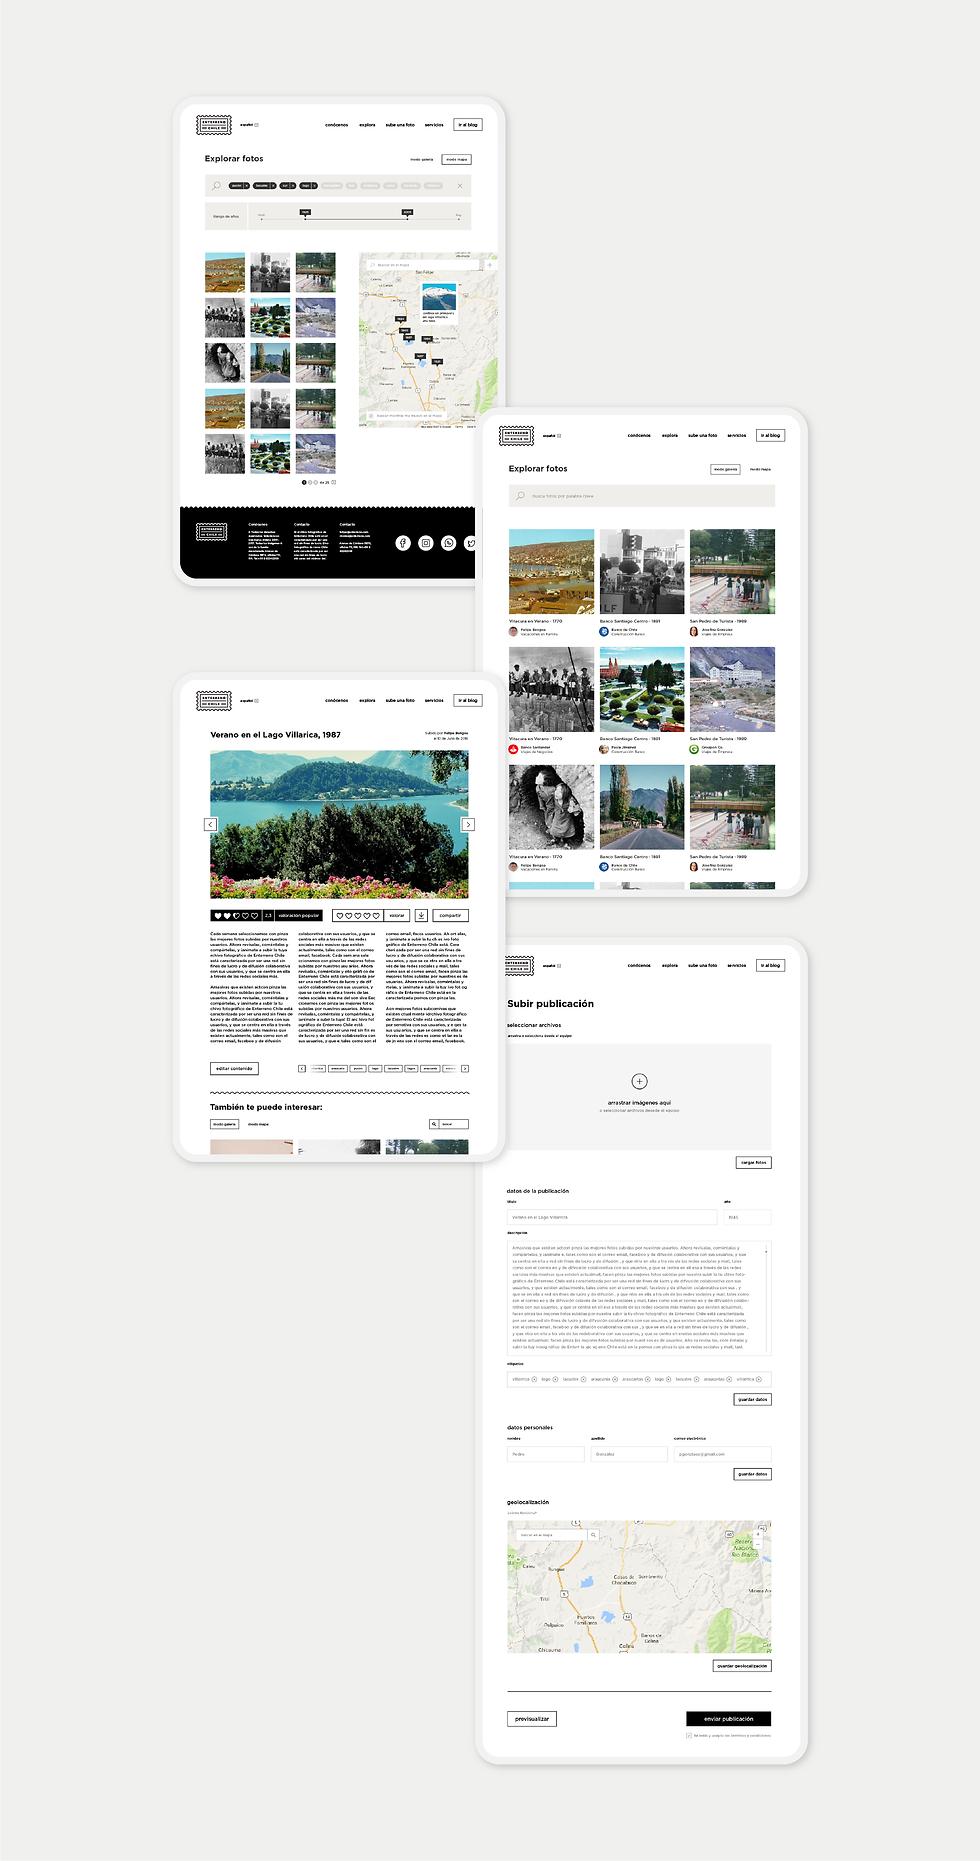 Imagenes Web-07.png